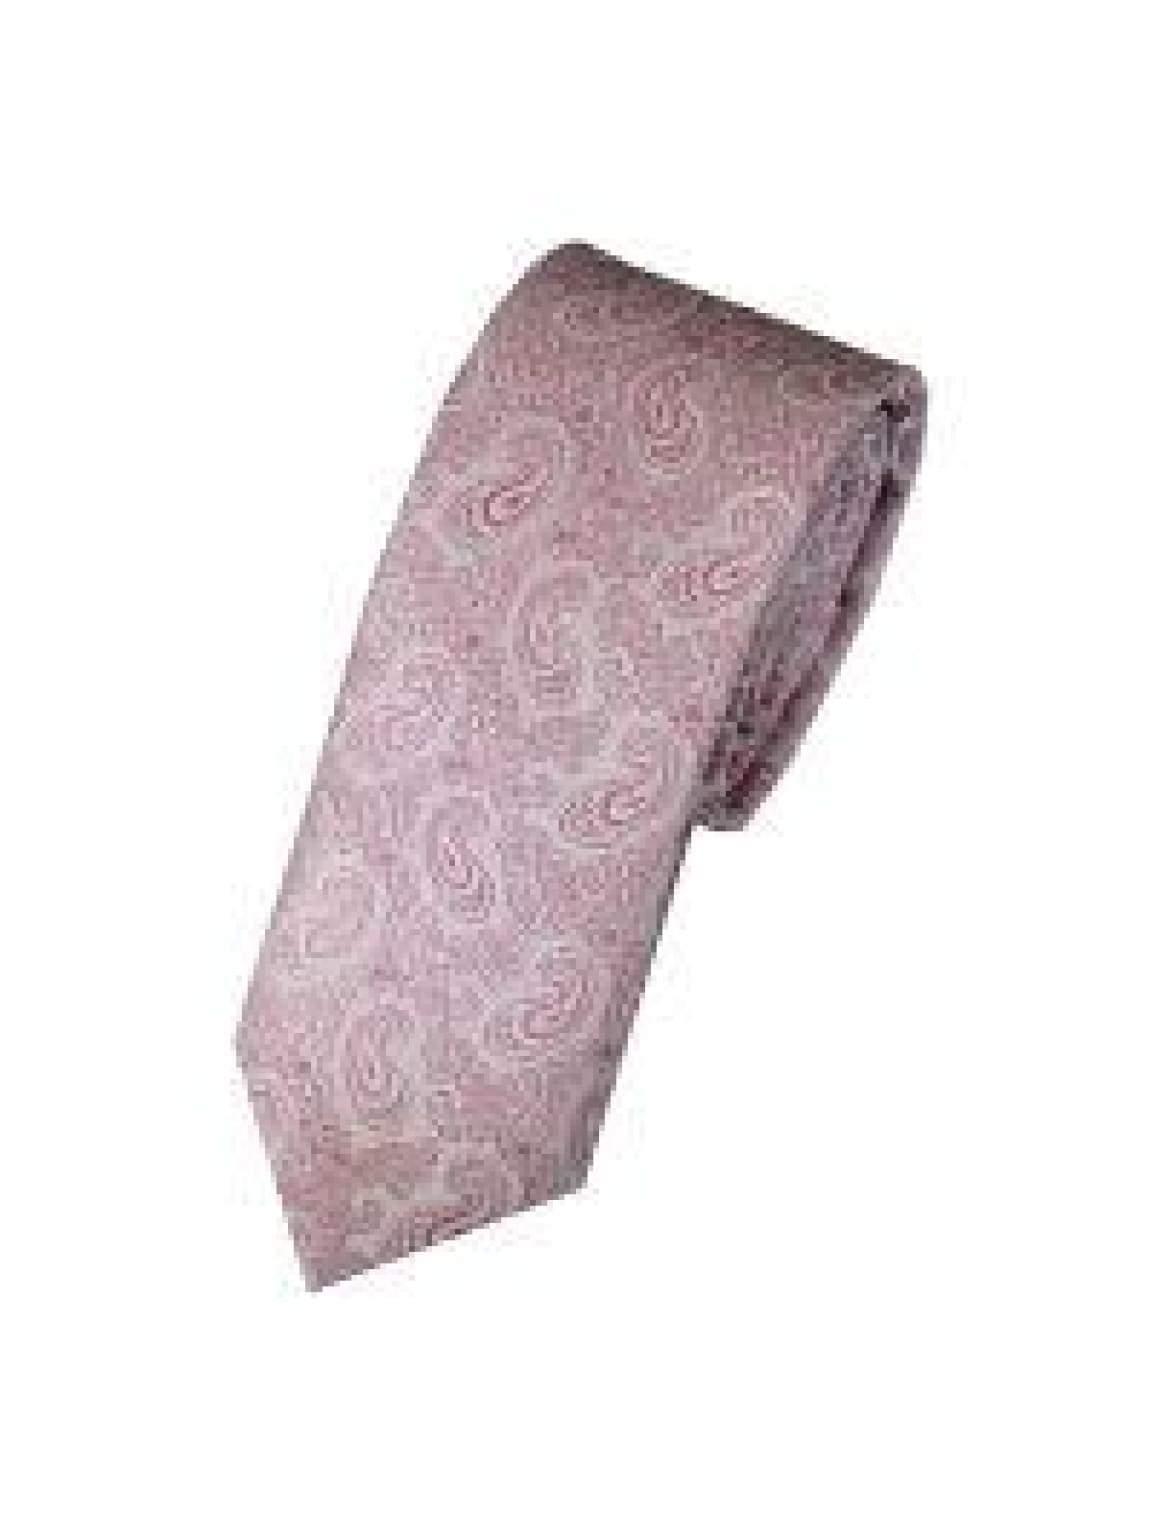 LA Smith Pink Skinny Paisley Tie - Accessories